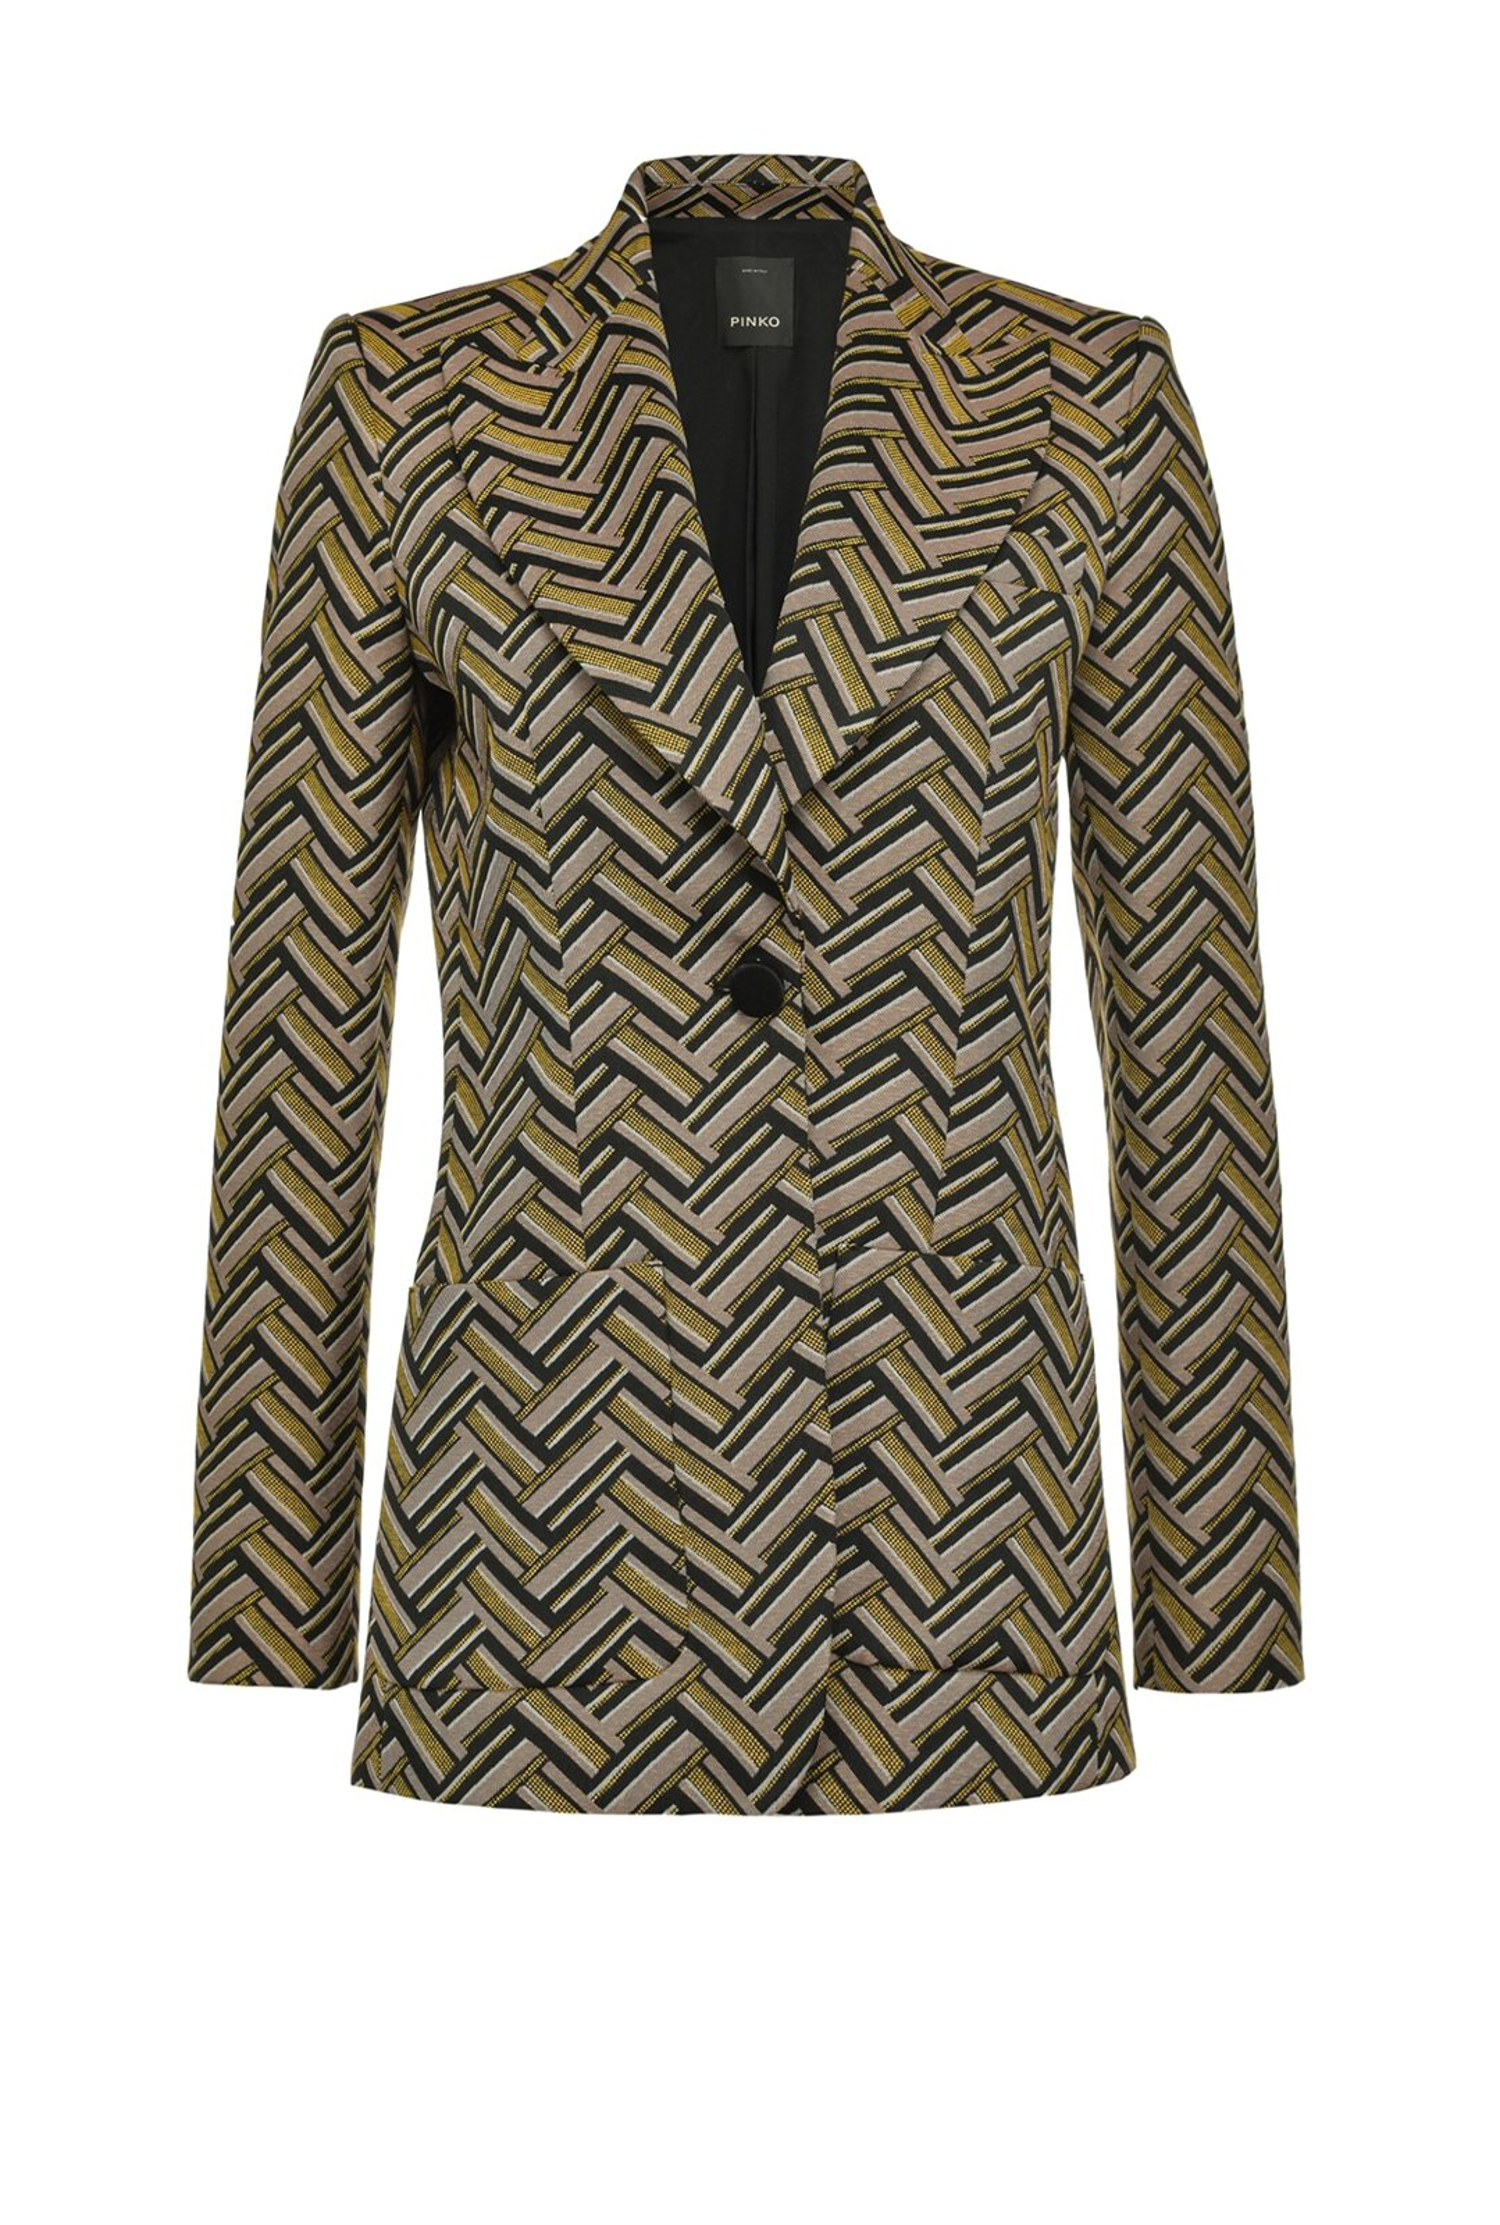 70s Jacquard Long Blazer - Pinko